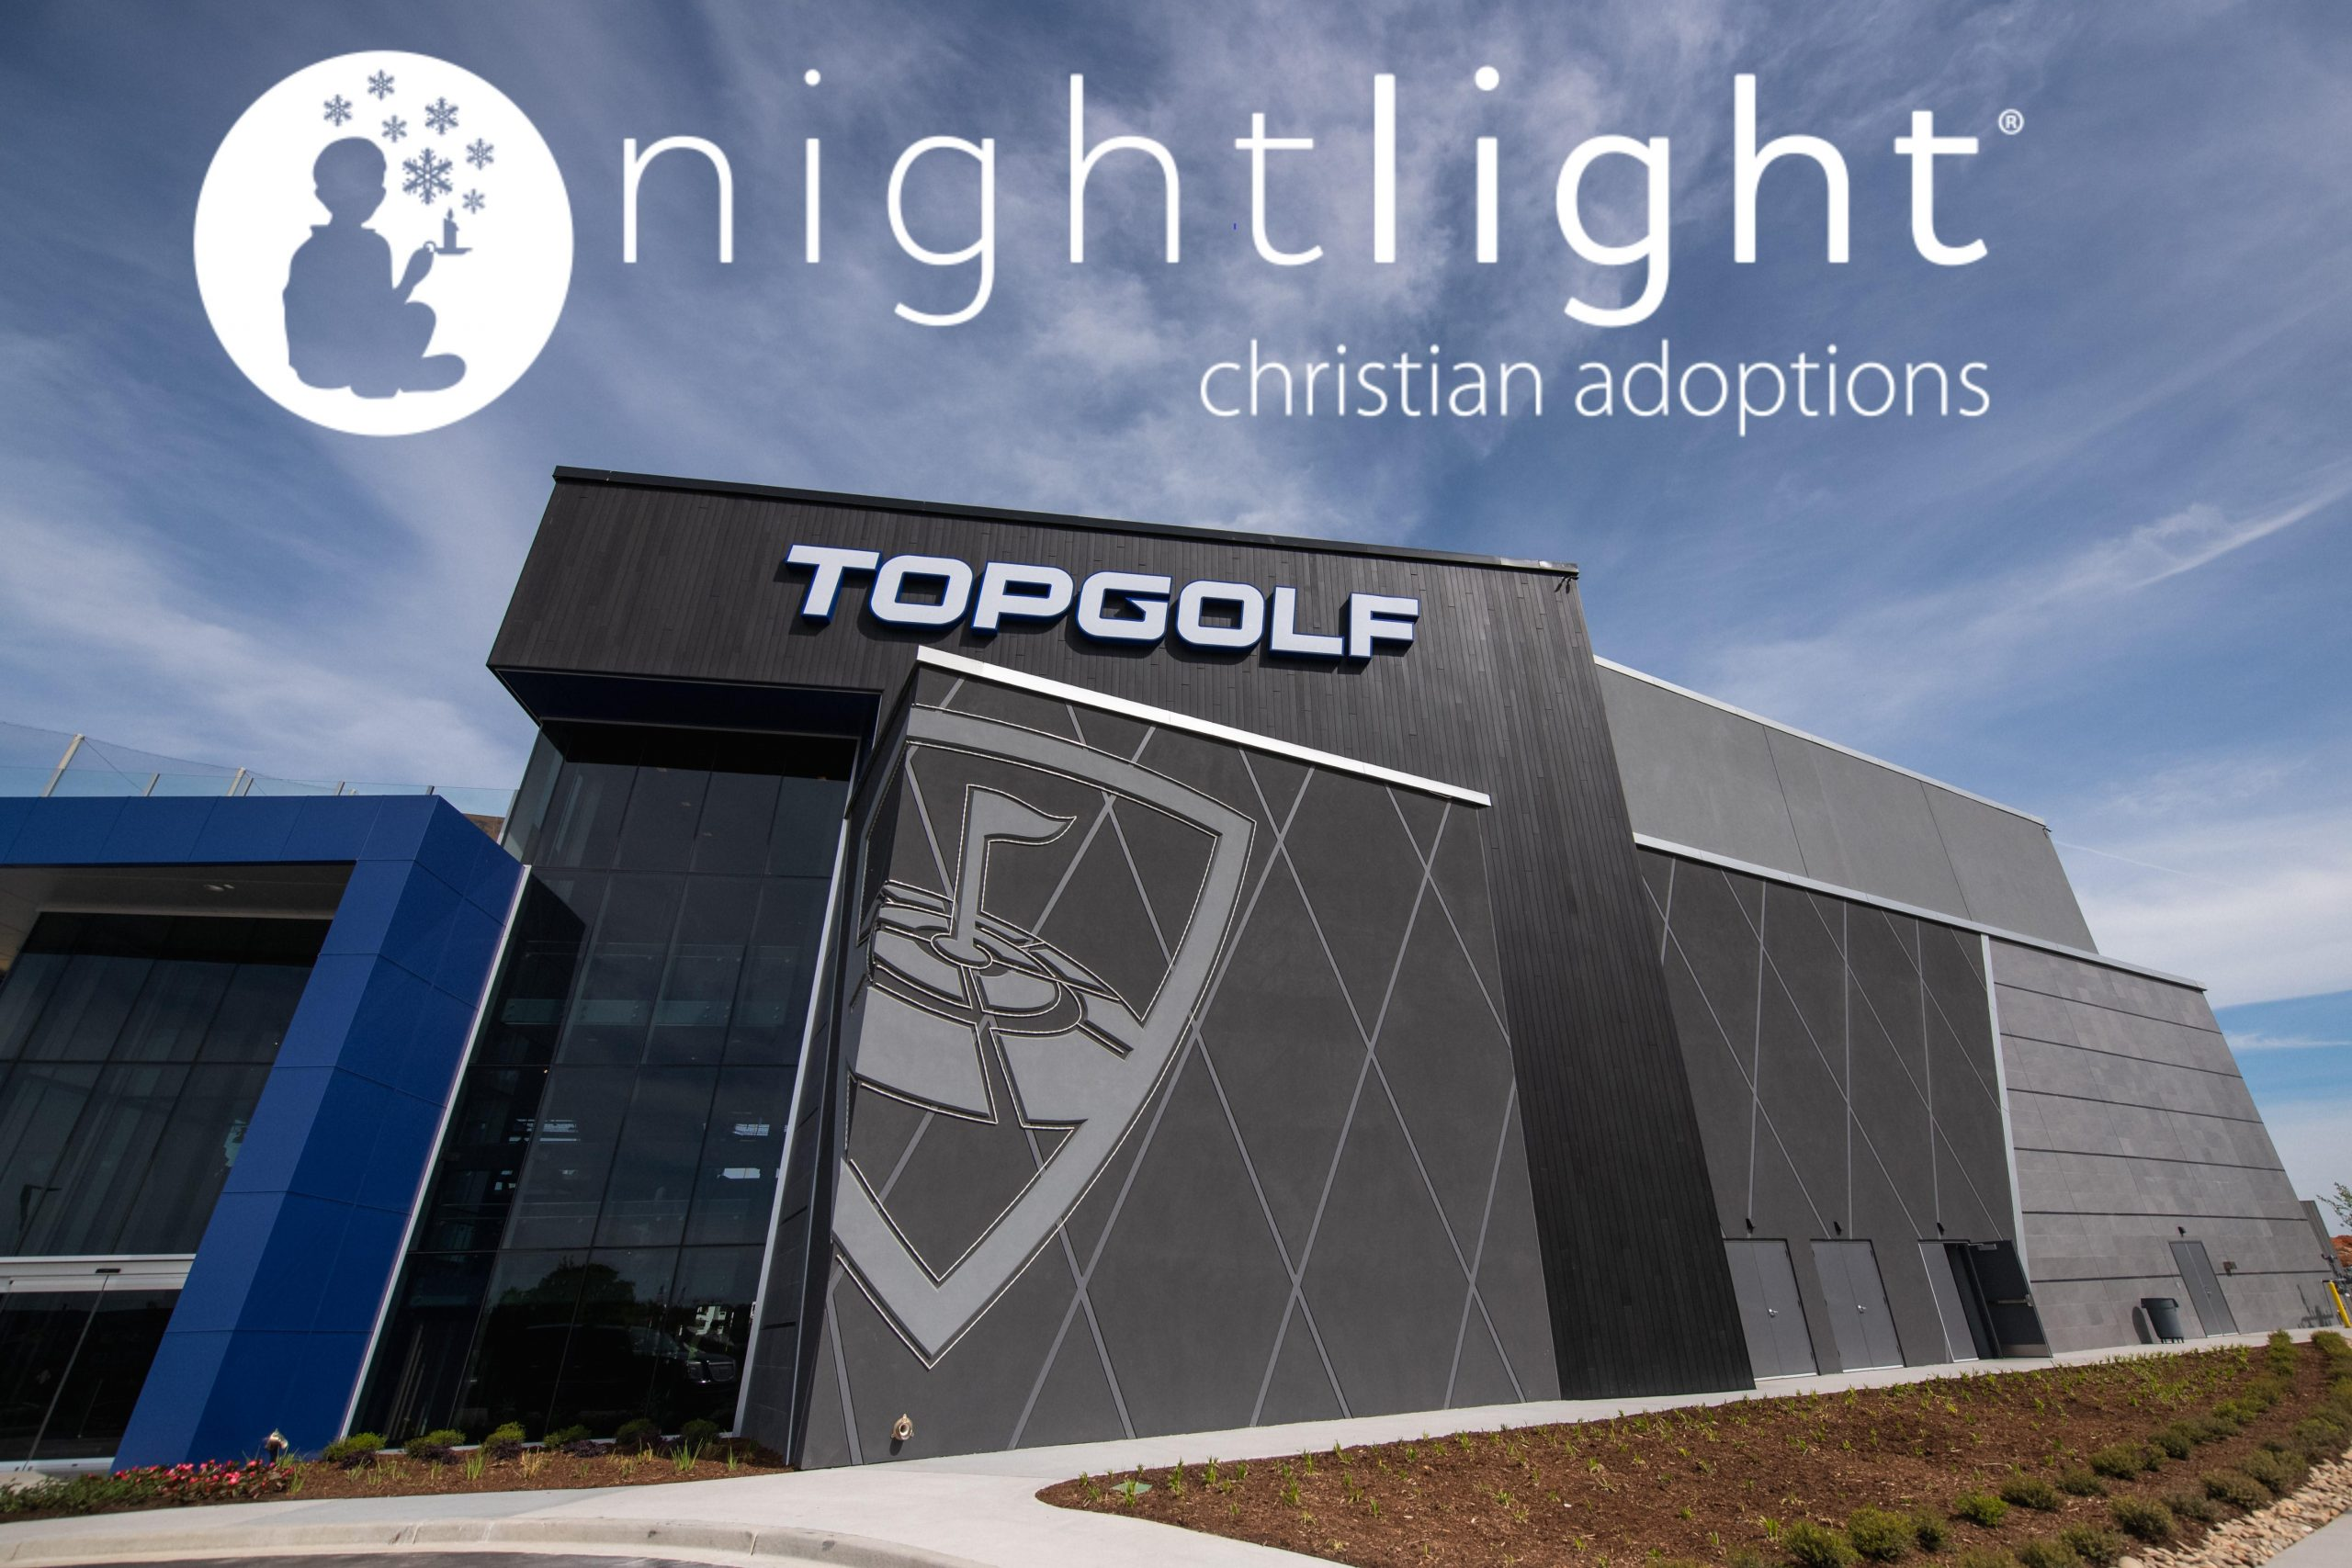 Nightlight Christian Adoptions First Annual Golf Tournament